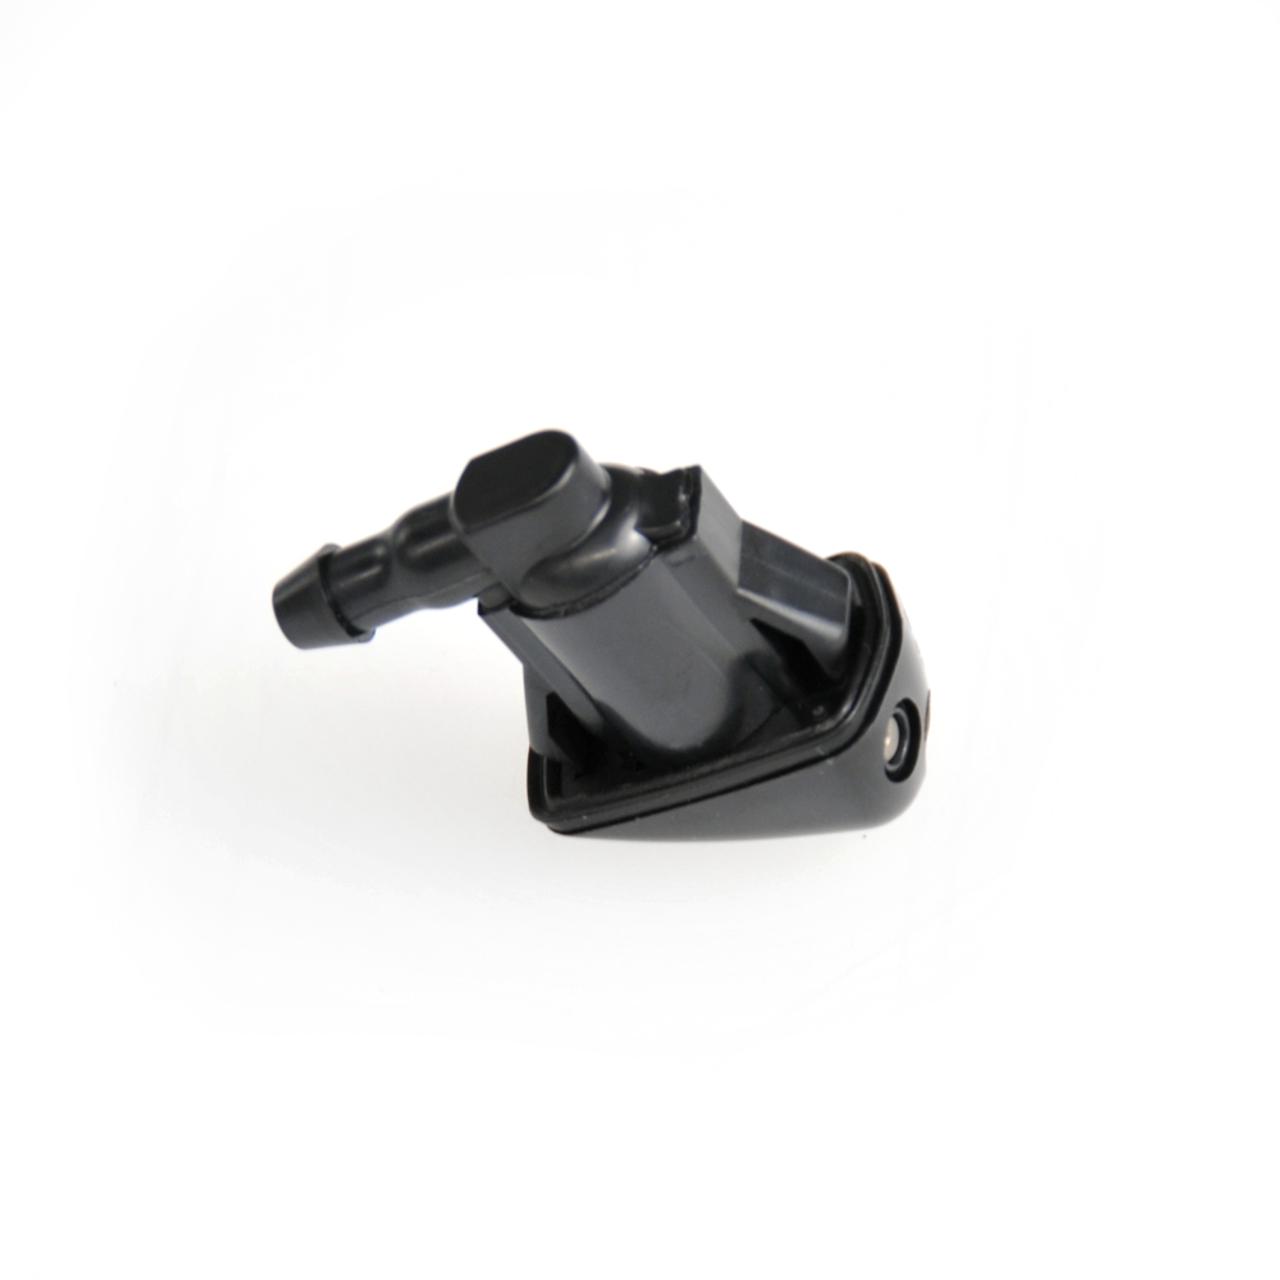 80 Series Windshield Washer Nozzle Upgrade (WNU-1)